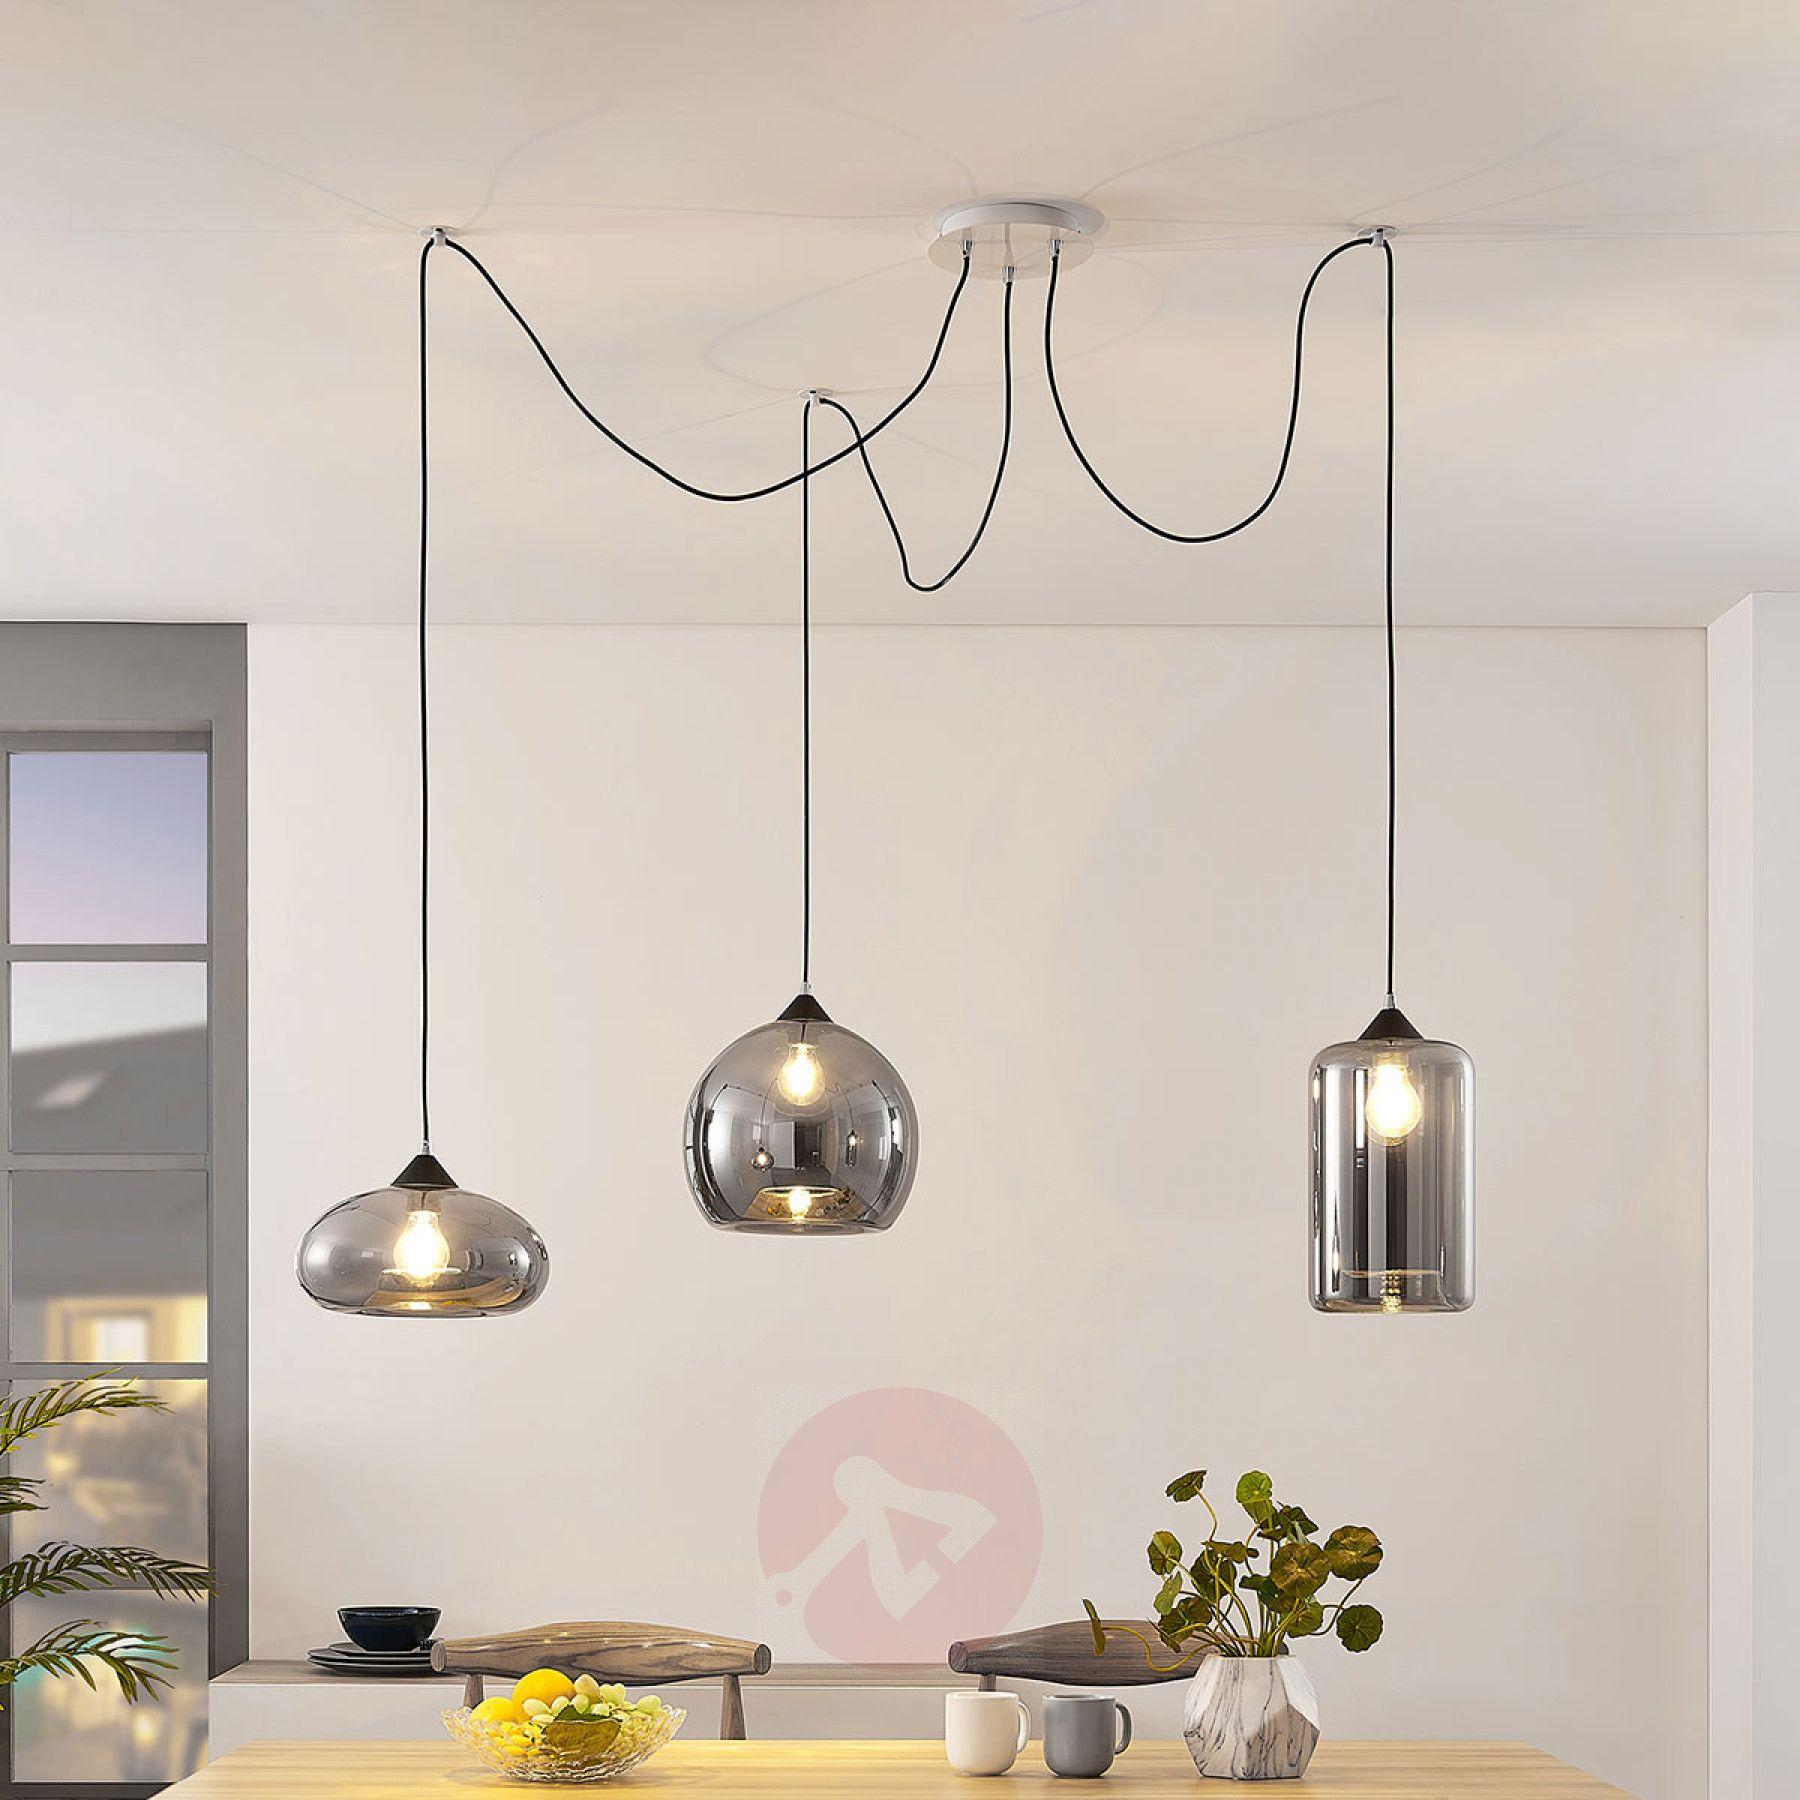 Hanglamp Raquel 3 Lamps Rookglazen Kappen 9624322 02 Hanglamp Plafondlamp Vintage Lampen